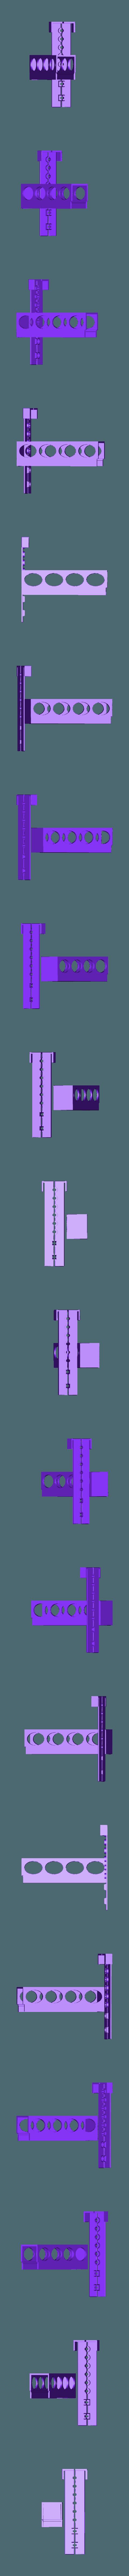 Fb3f0244 995d 40d2 ab6a 0c45762c9a0c